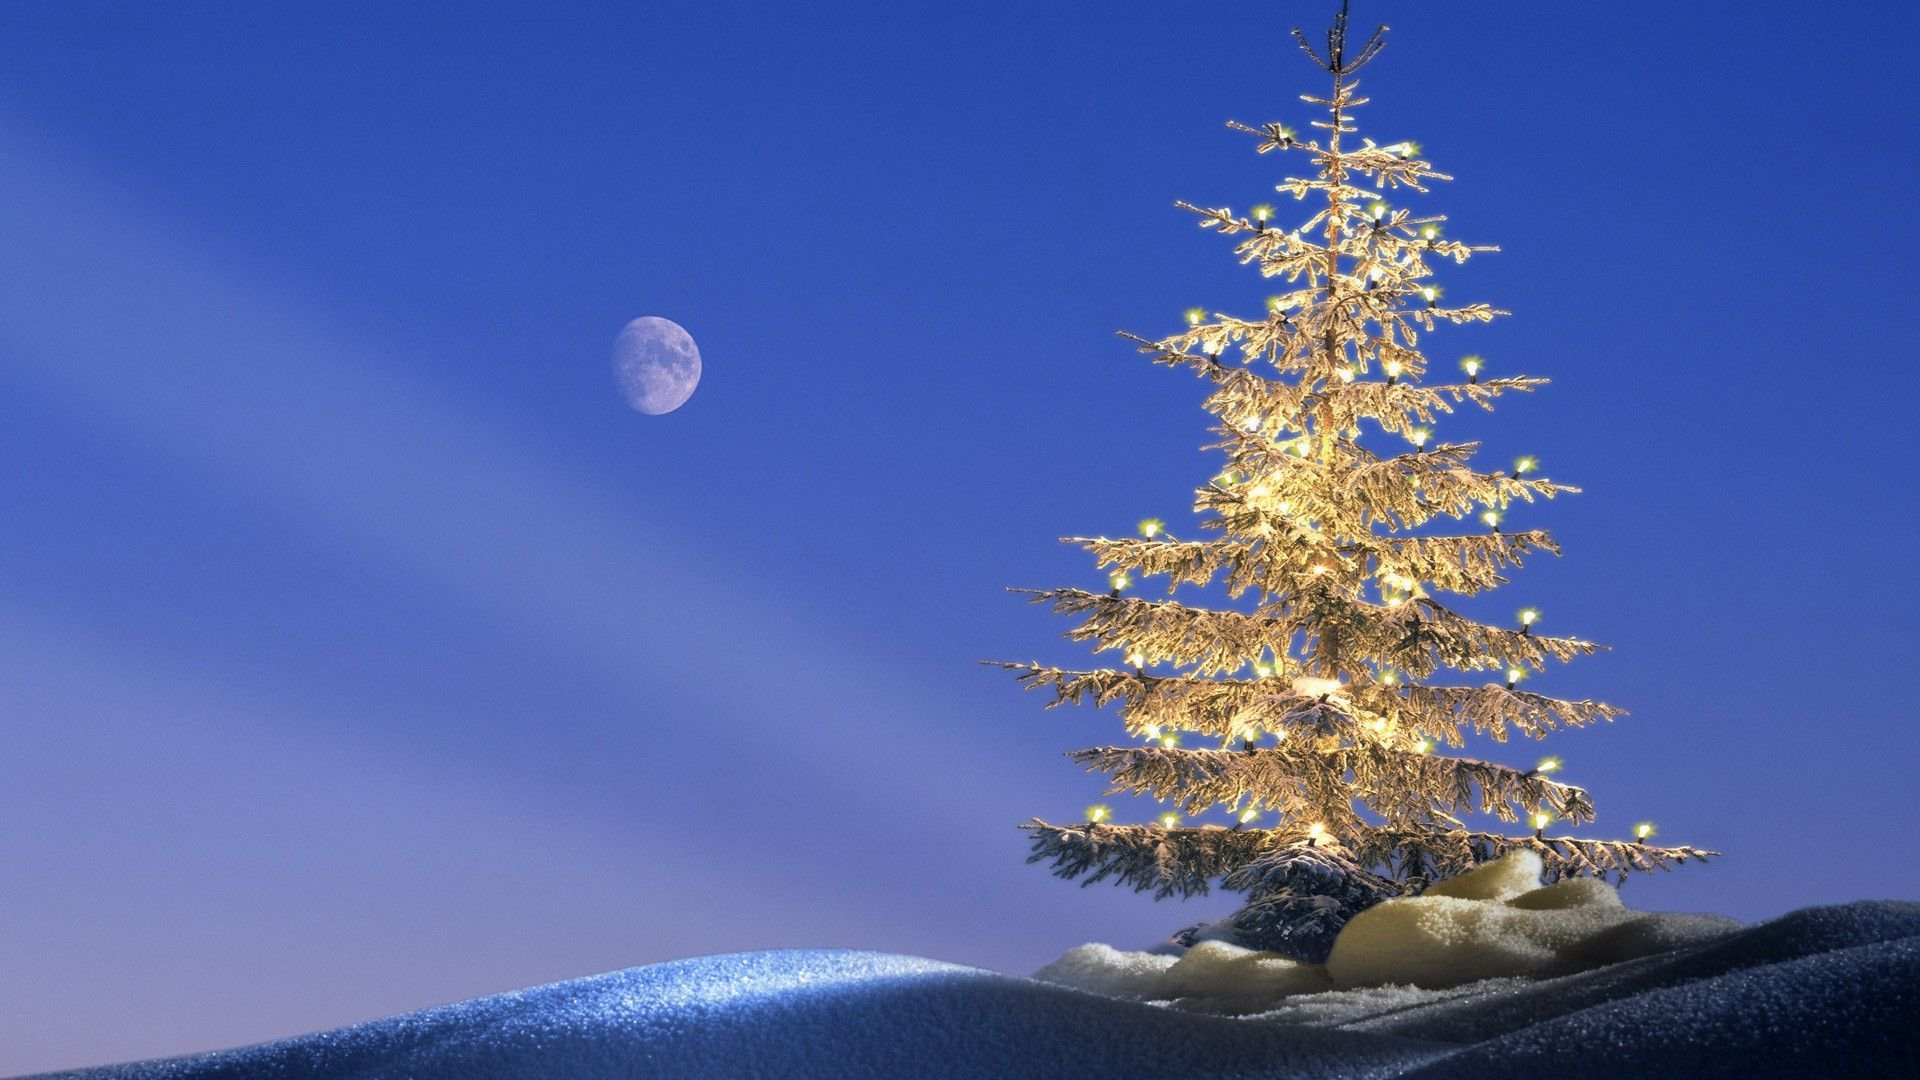 happy christmas golden tree lights snow moon hd wallpaper